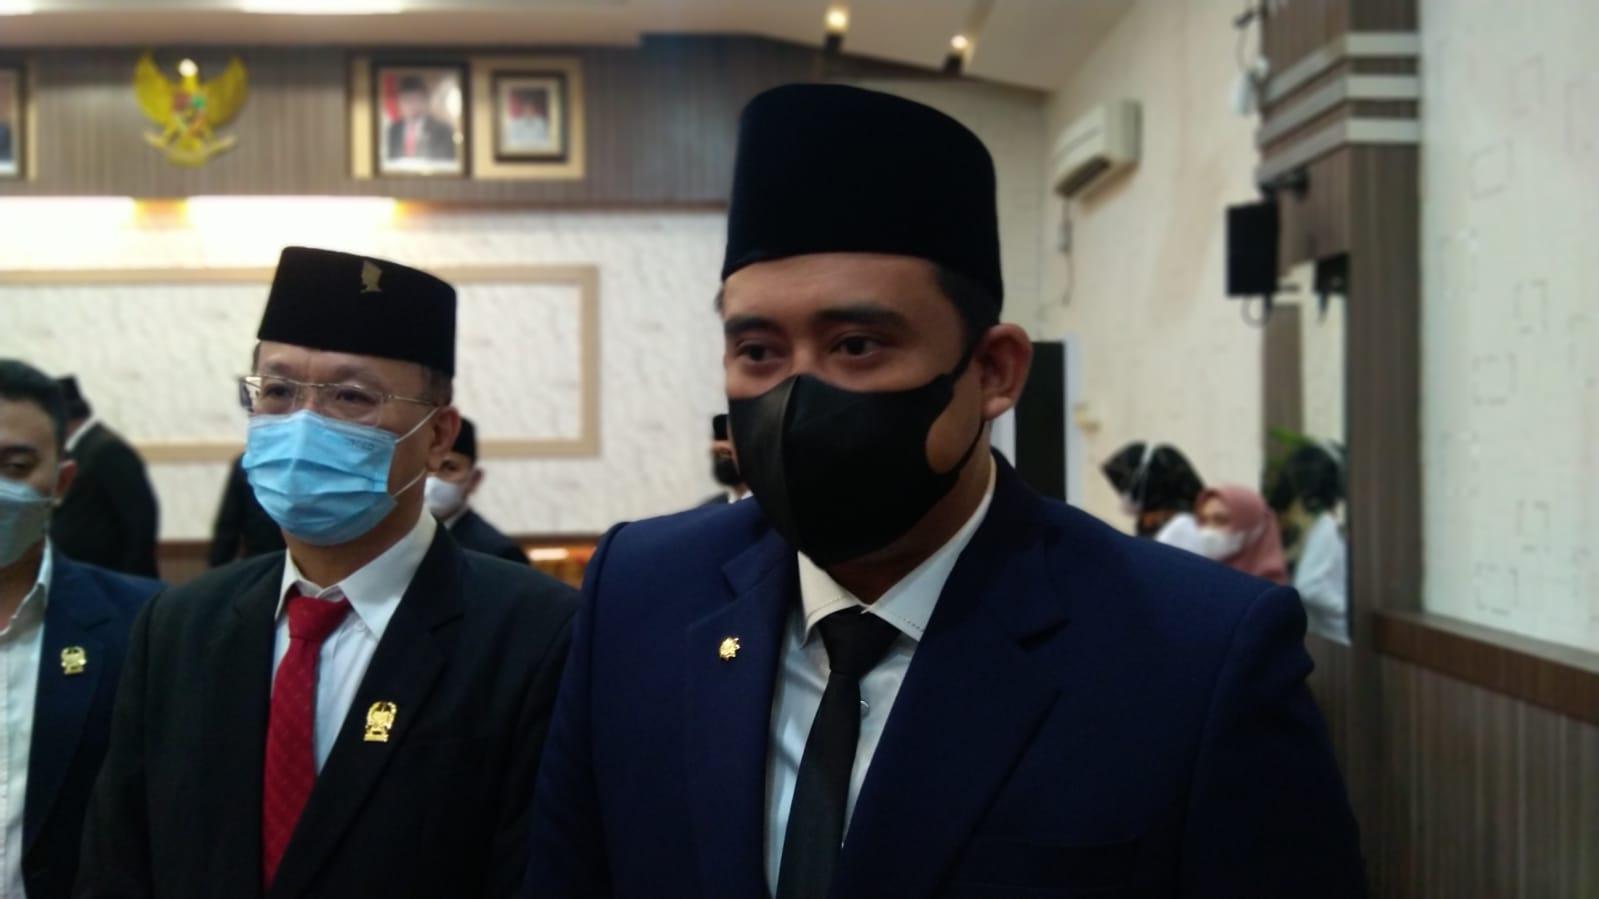 Wali Kota Medan Tutup Lokasi Isoter KM Bukit Raya di Belawan, Kembalikan Kapal ke PT Pelni